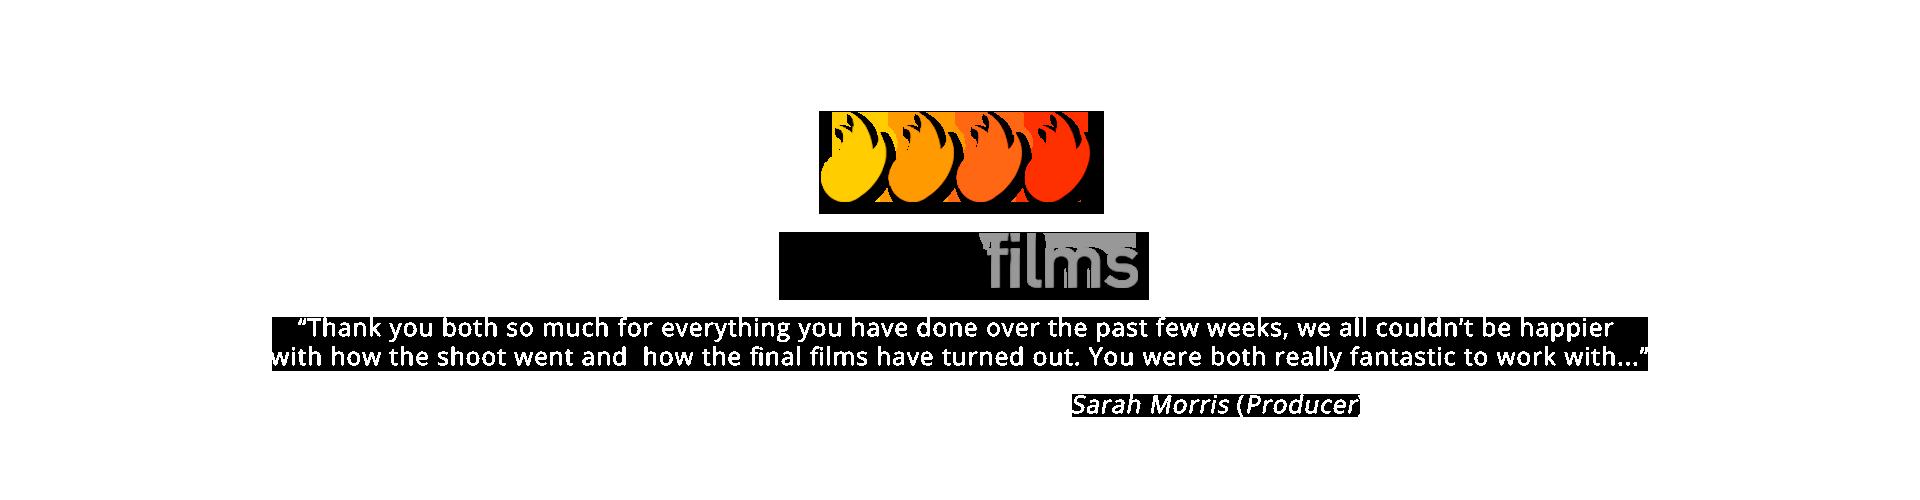 Scorch Films